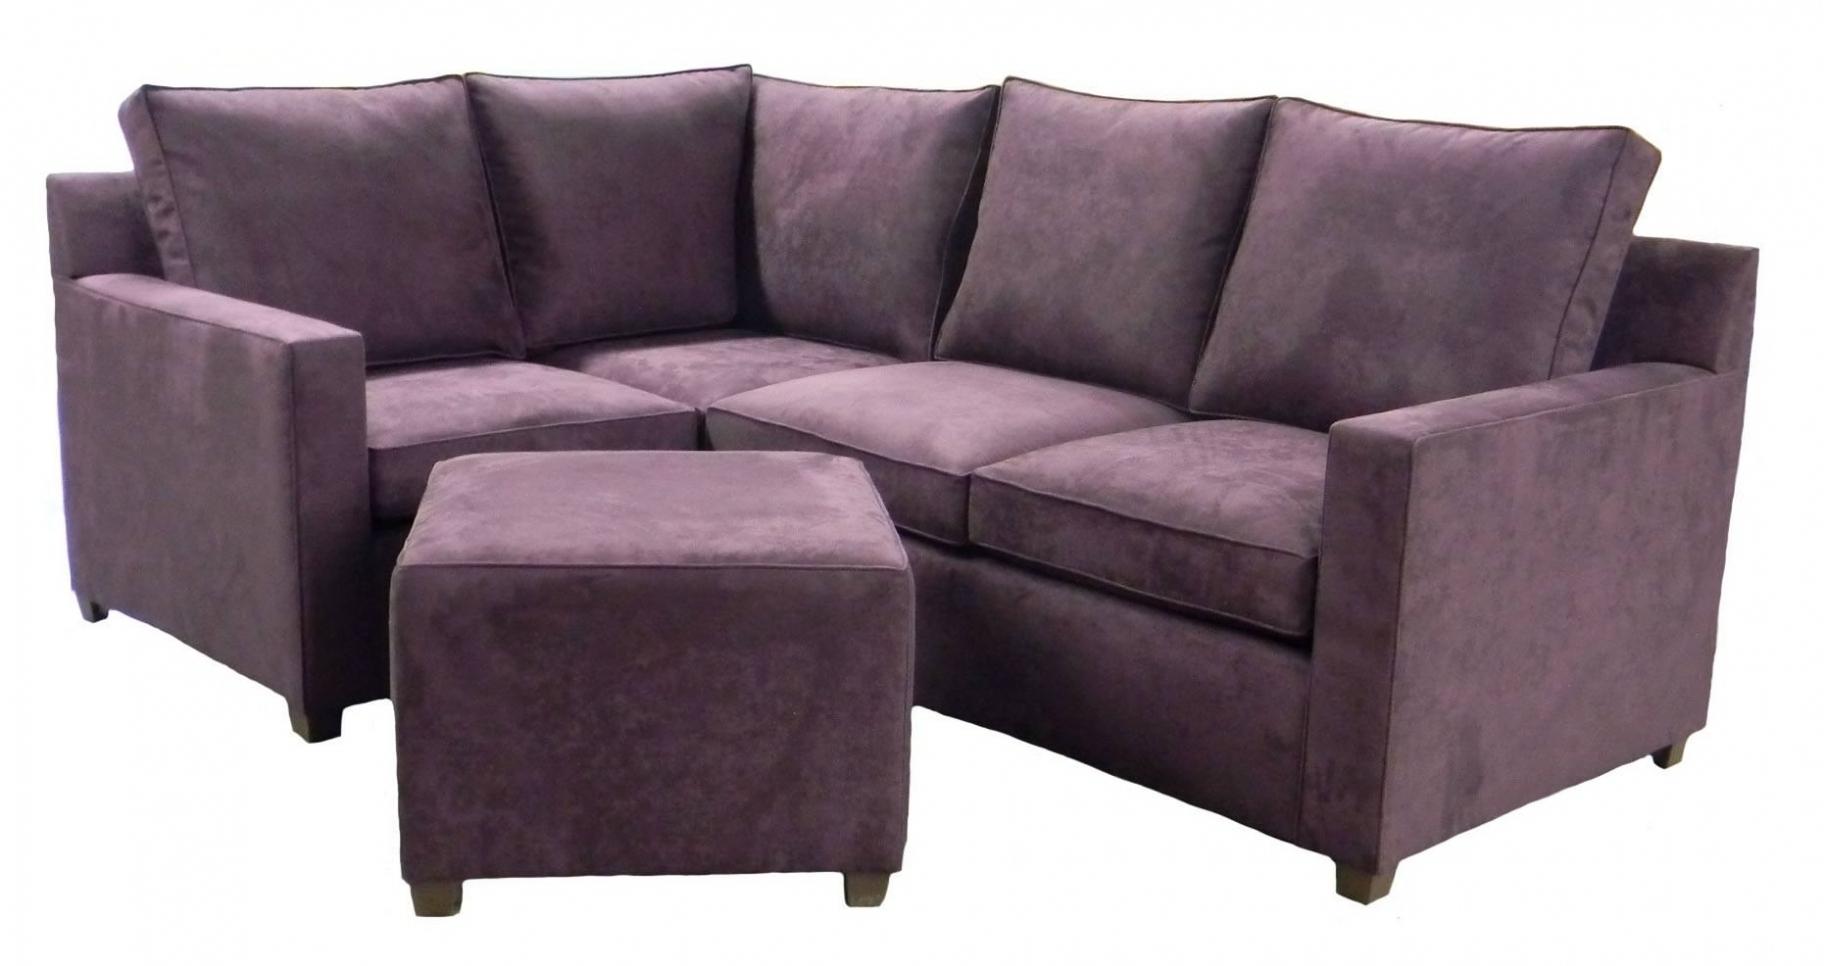 Furniture ~ Sectional Sofa Design: Apartment Size Sectional Sofa Bed In Apartment Size Sofas (View 10 of 10)